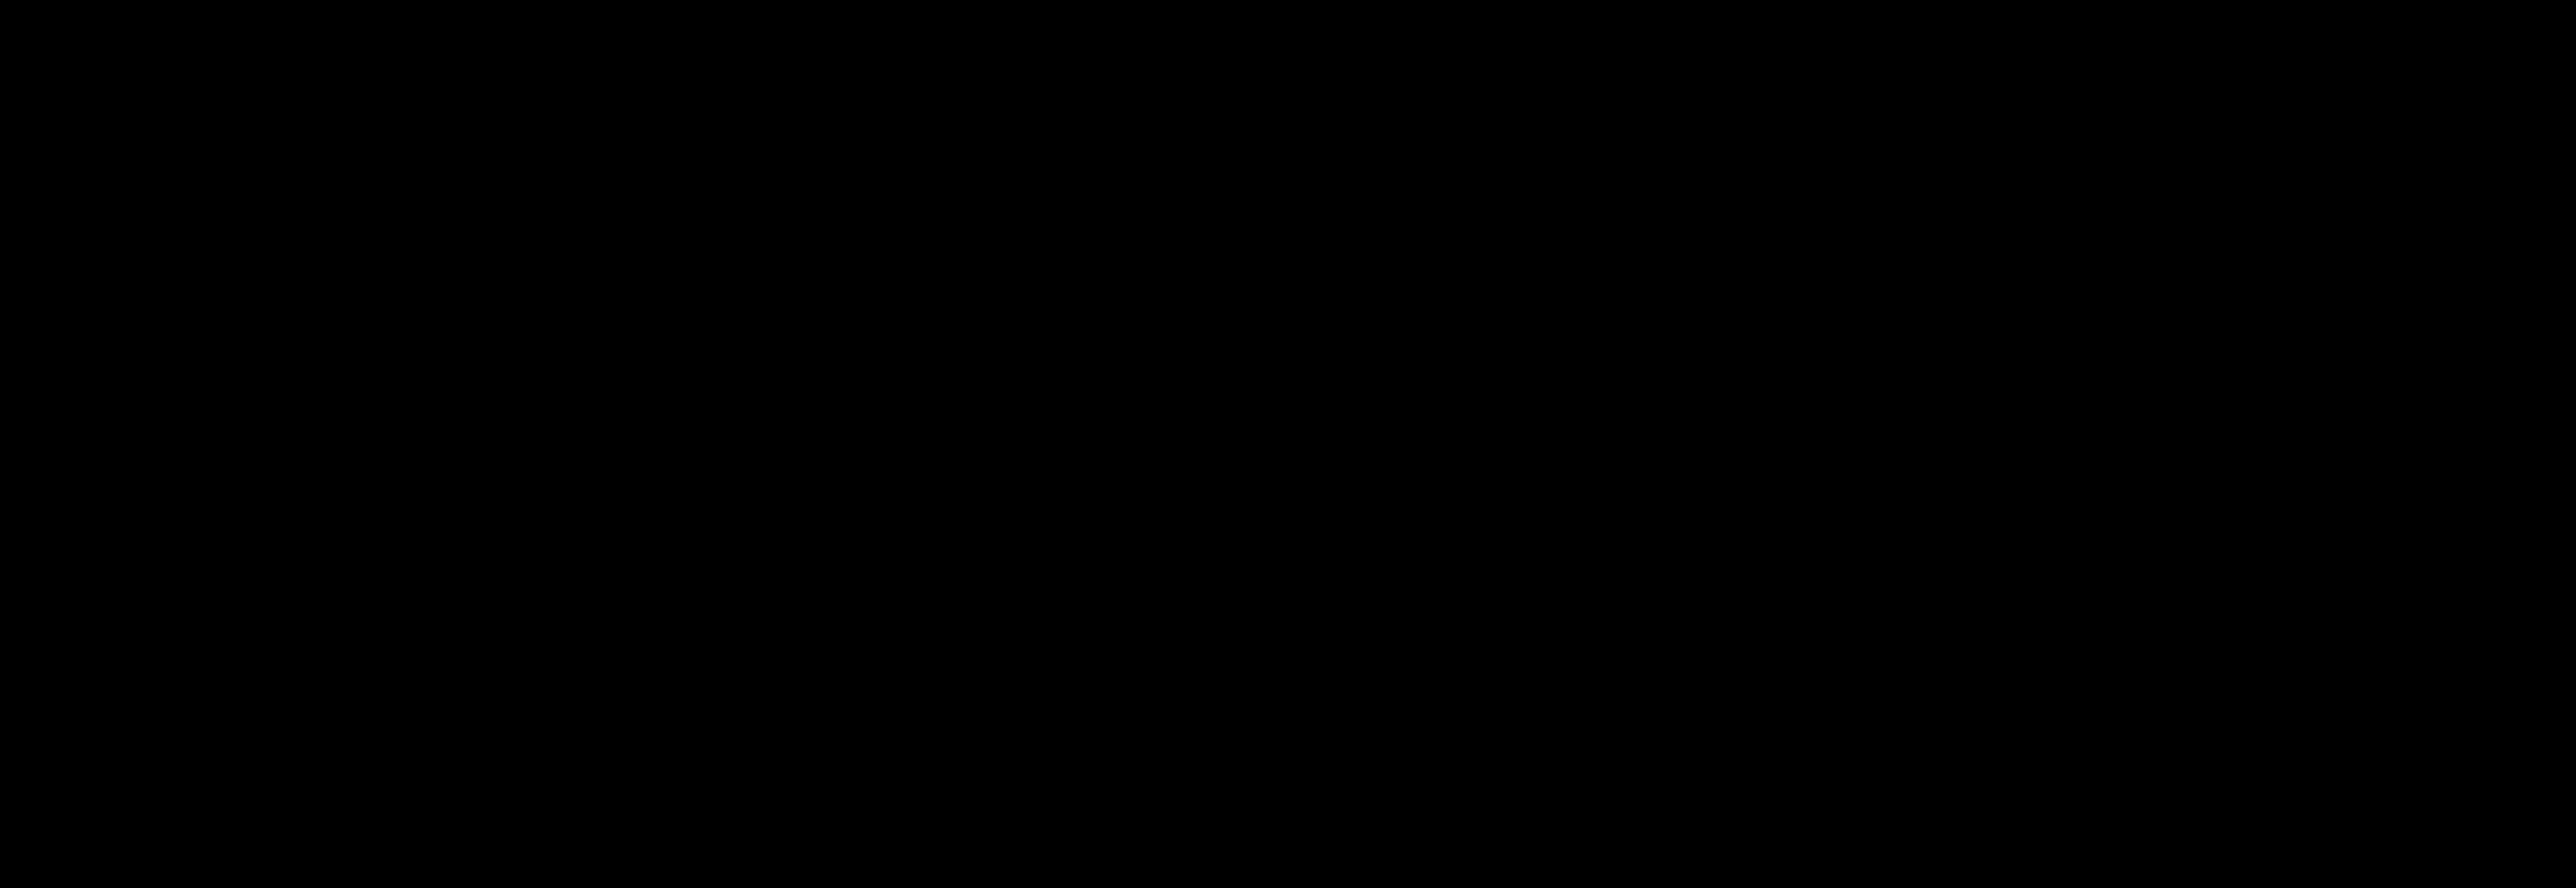 407-4071827_logo-black-png